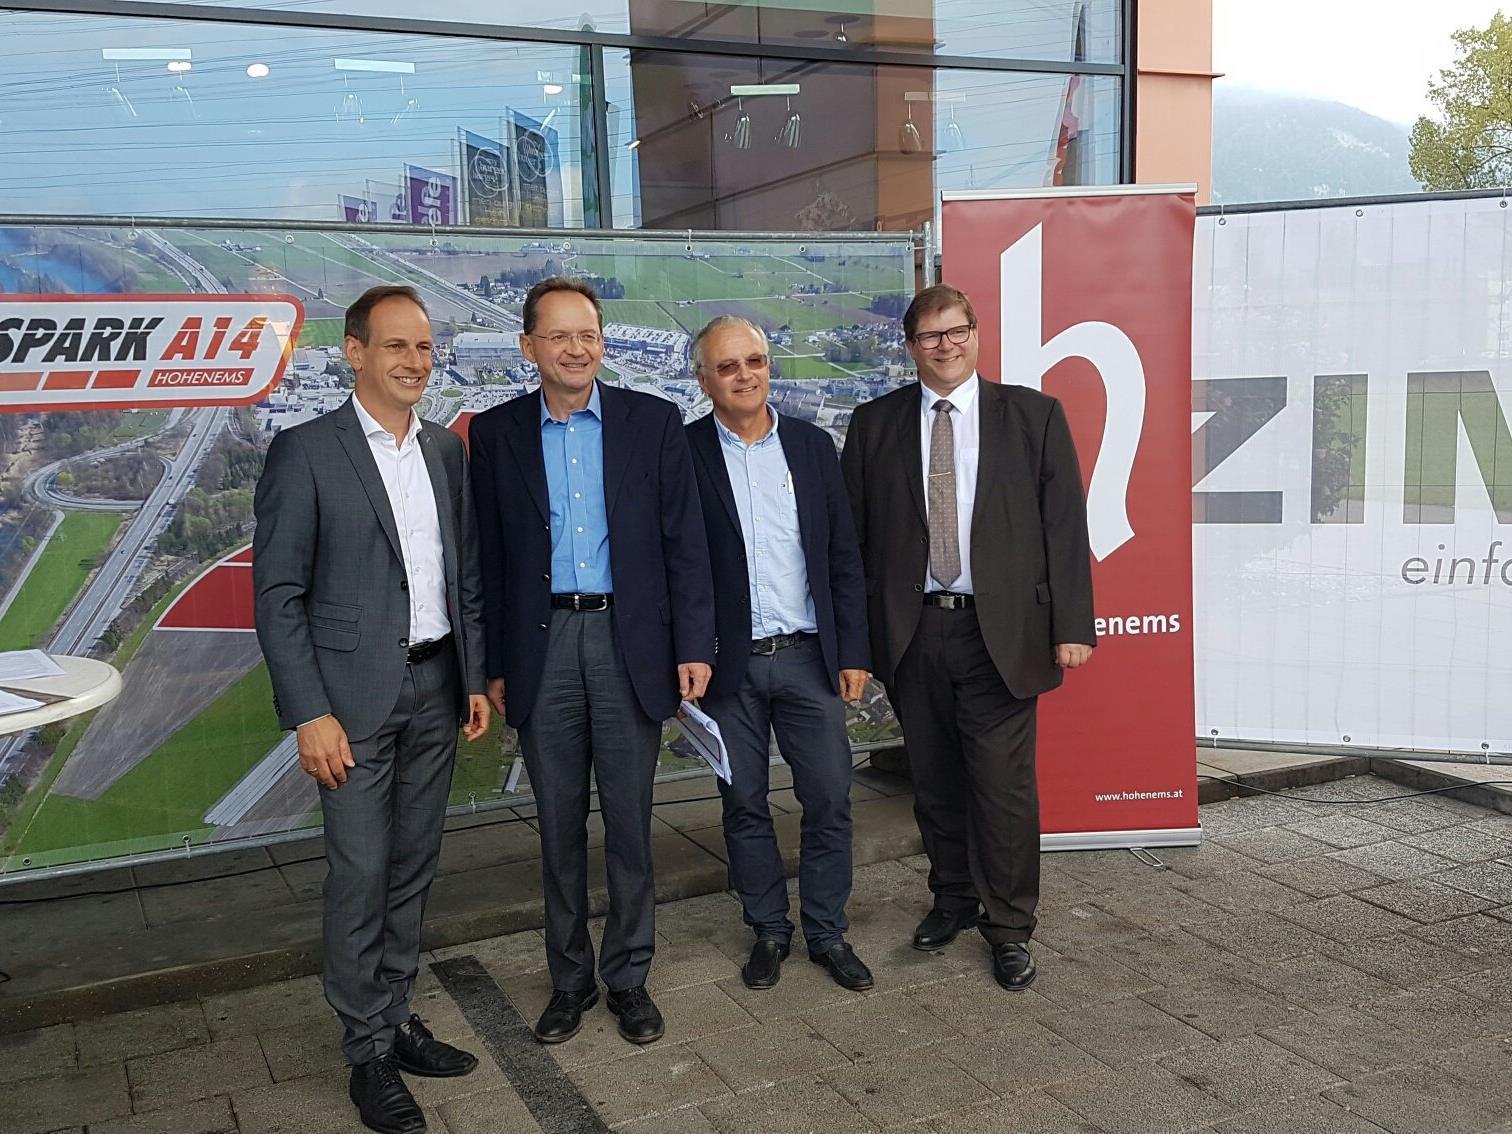 v. l. Bürgermeister Dieter Egger, GRASS-Geschäftsführer Christoph Walter, ZIMA-Geschäftsführer Mag. Elmar Girardi, Wirtschaftsstadtrat Arno Gächter